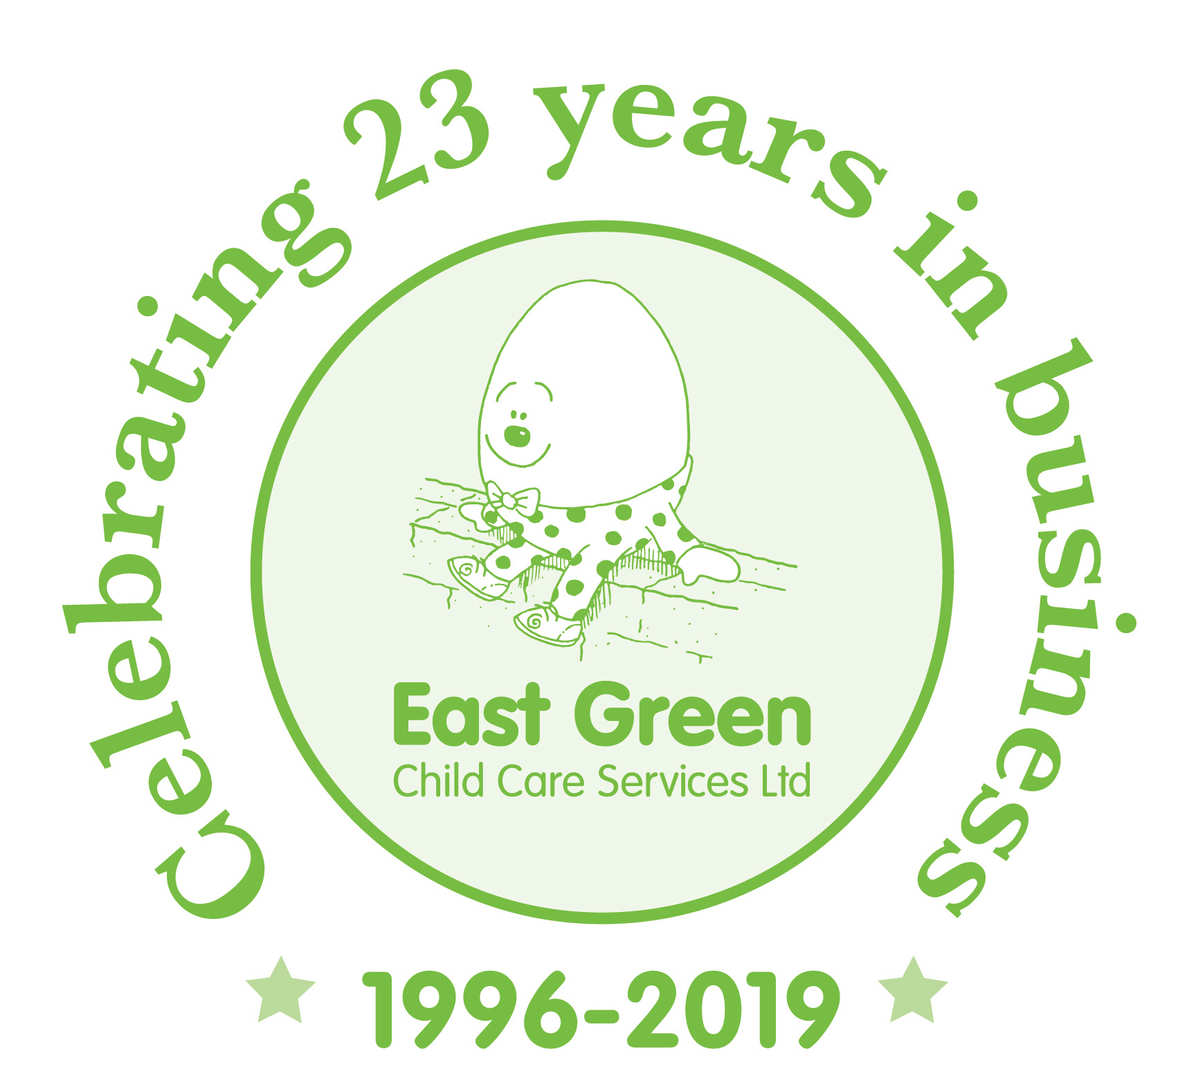 Eastgreen 23 years logo.jpg